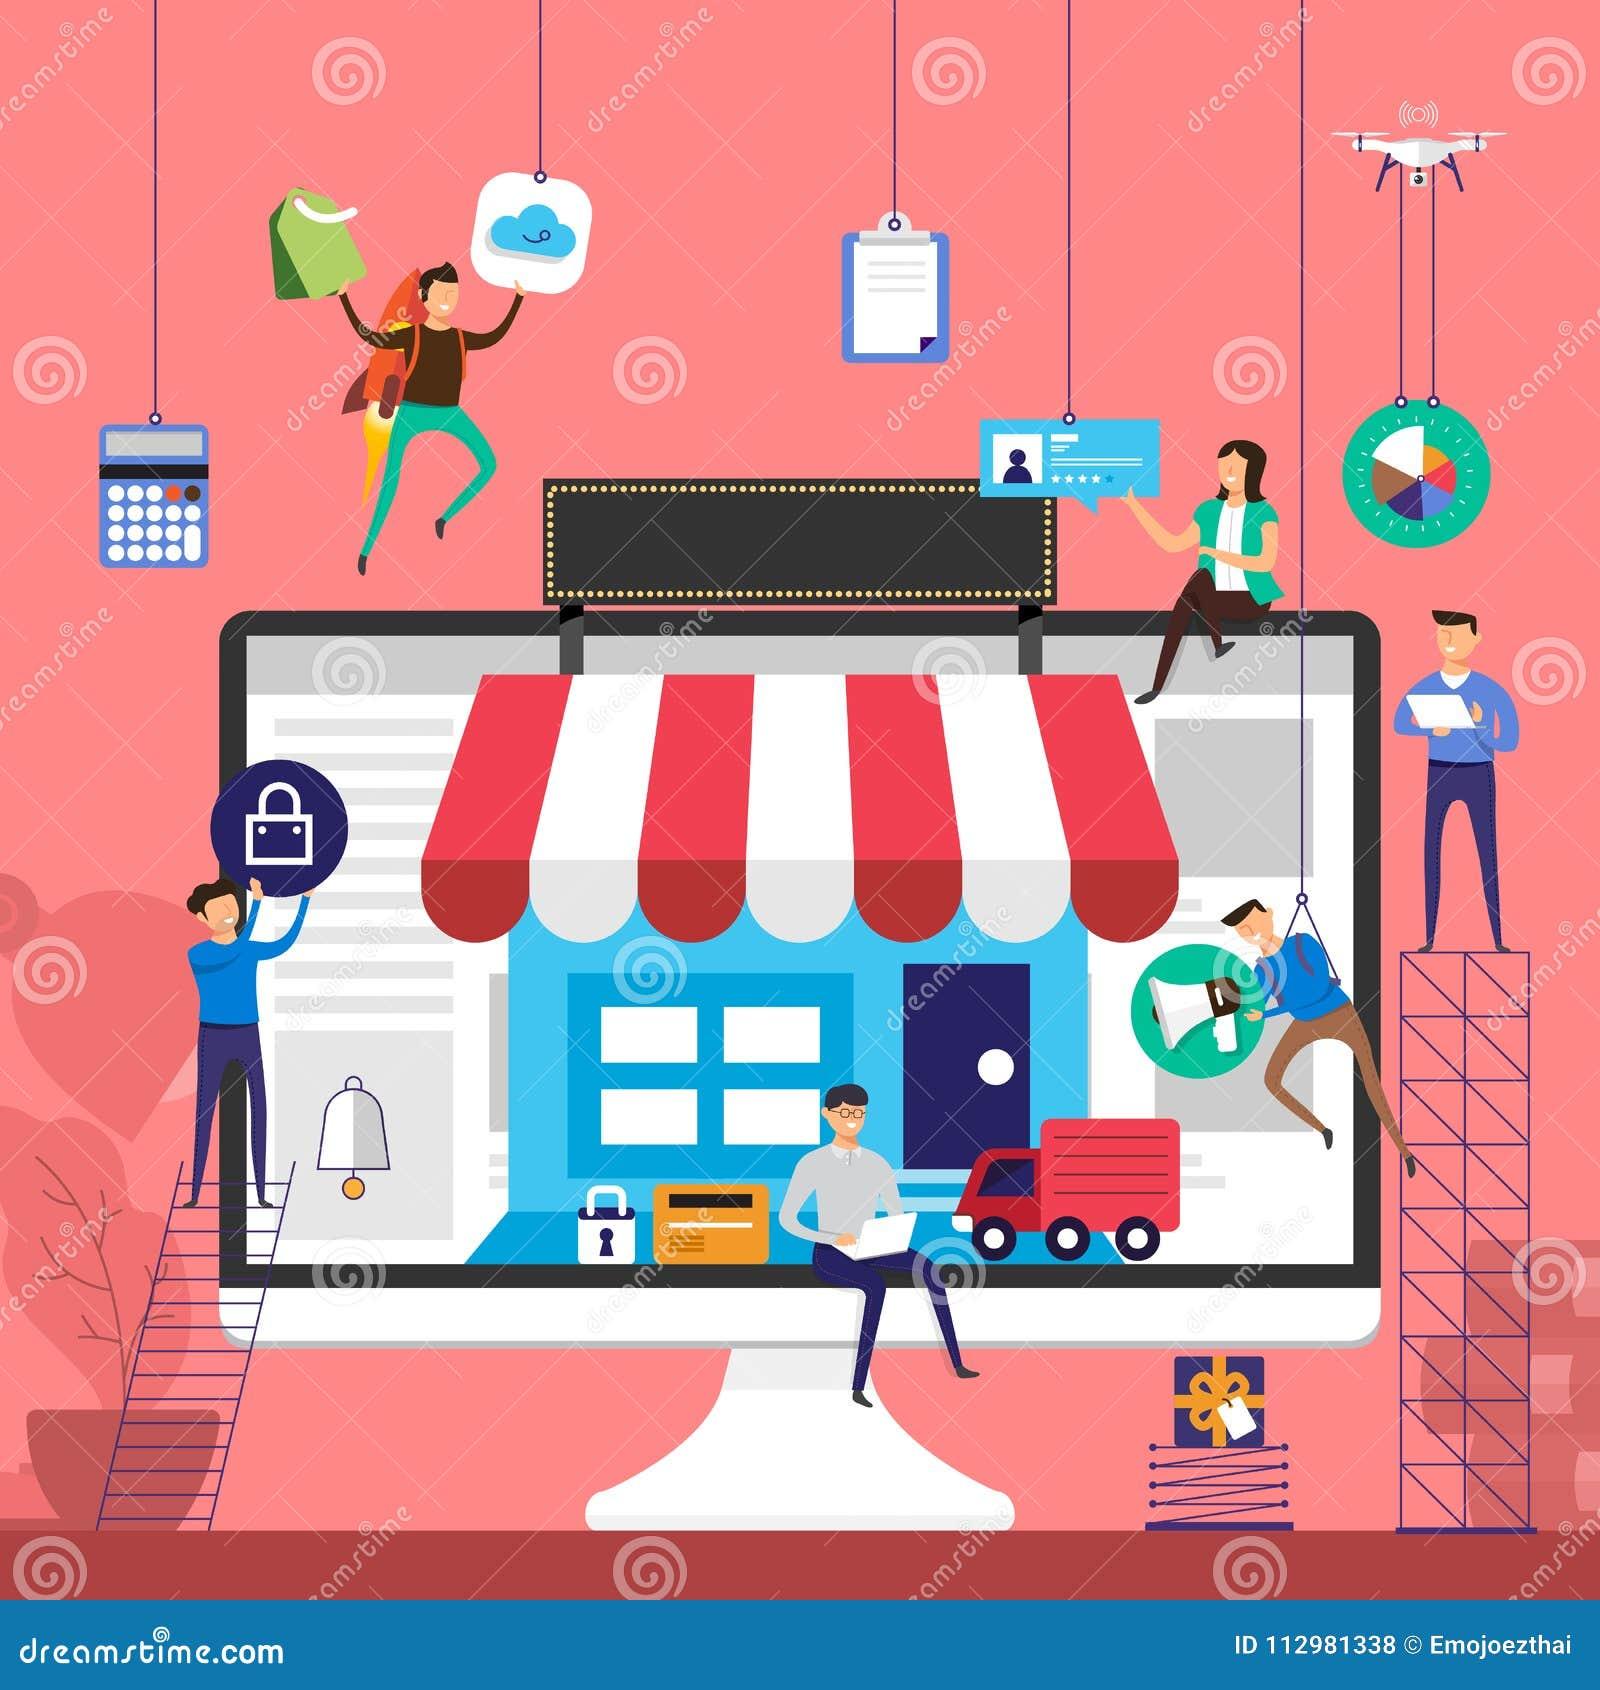 Flat design concept team working for online store e-commerce technology on desktop. Vector illustrate.